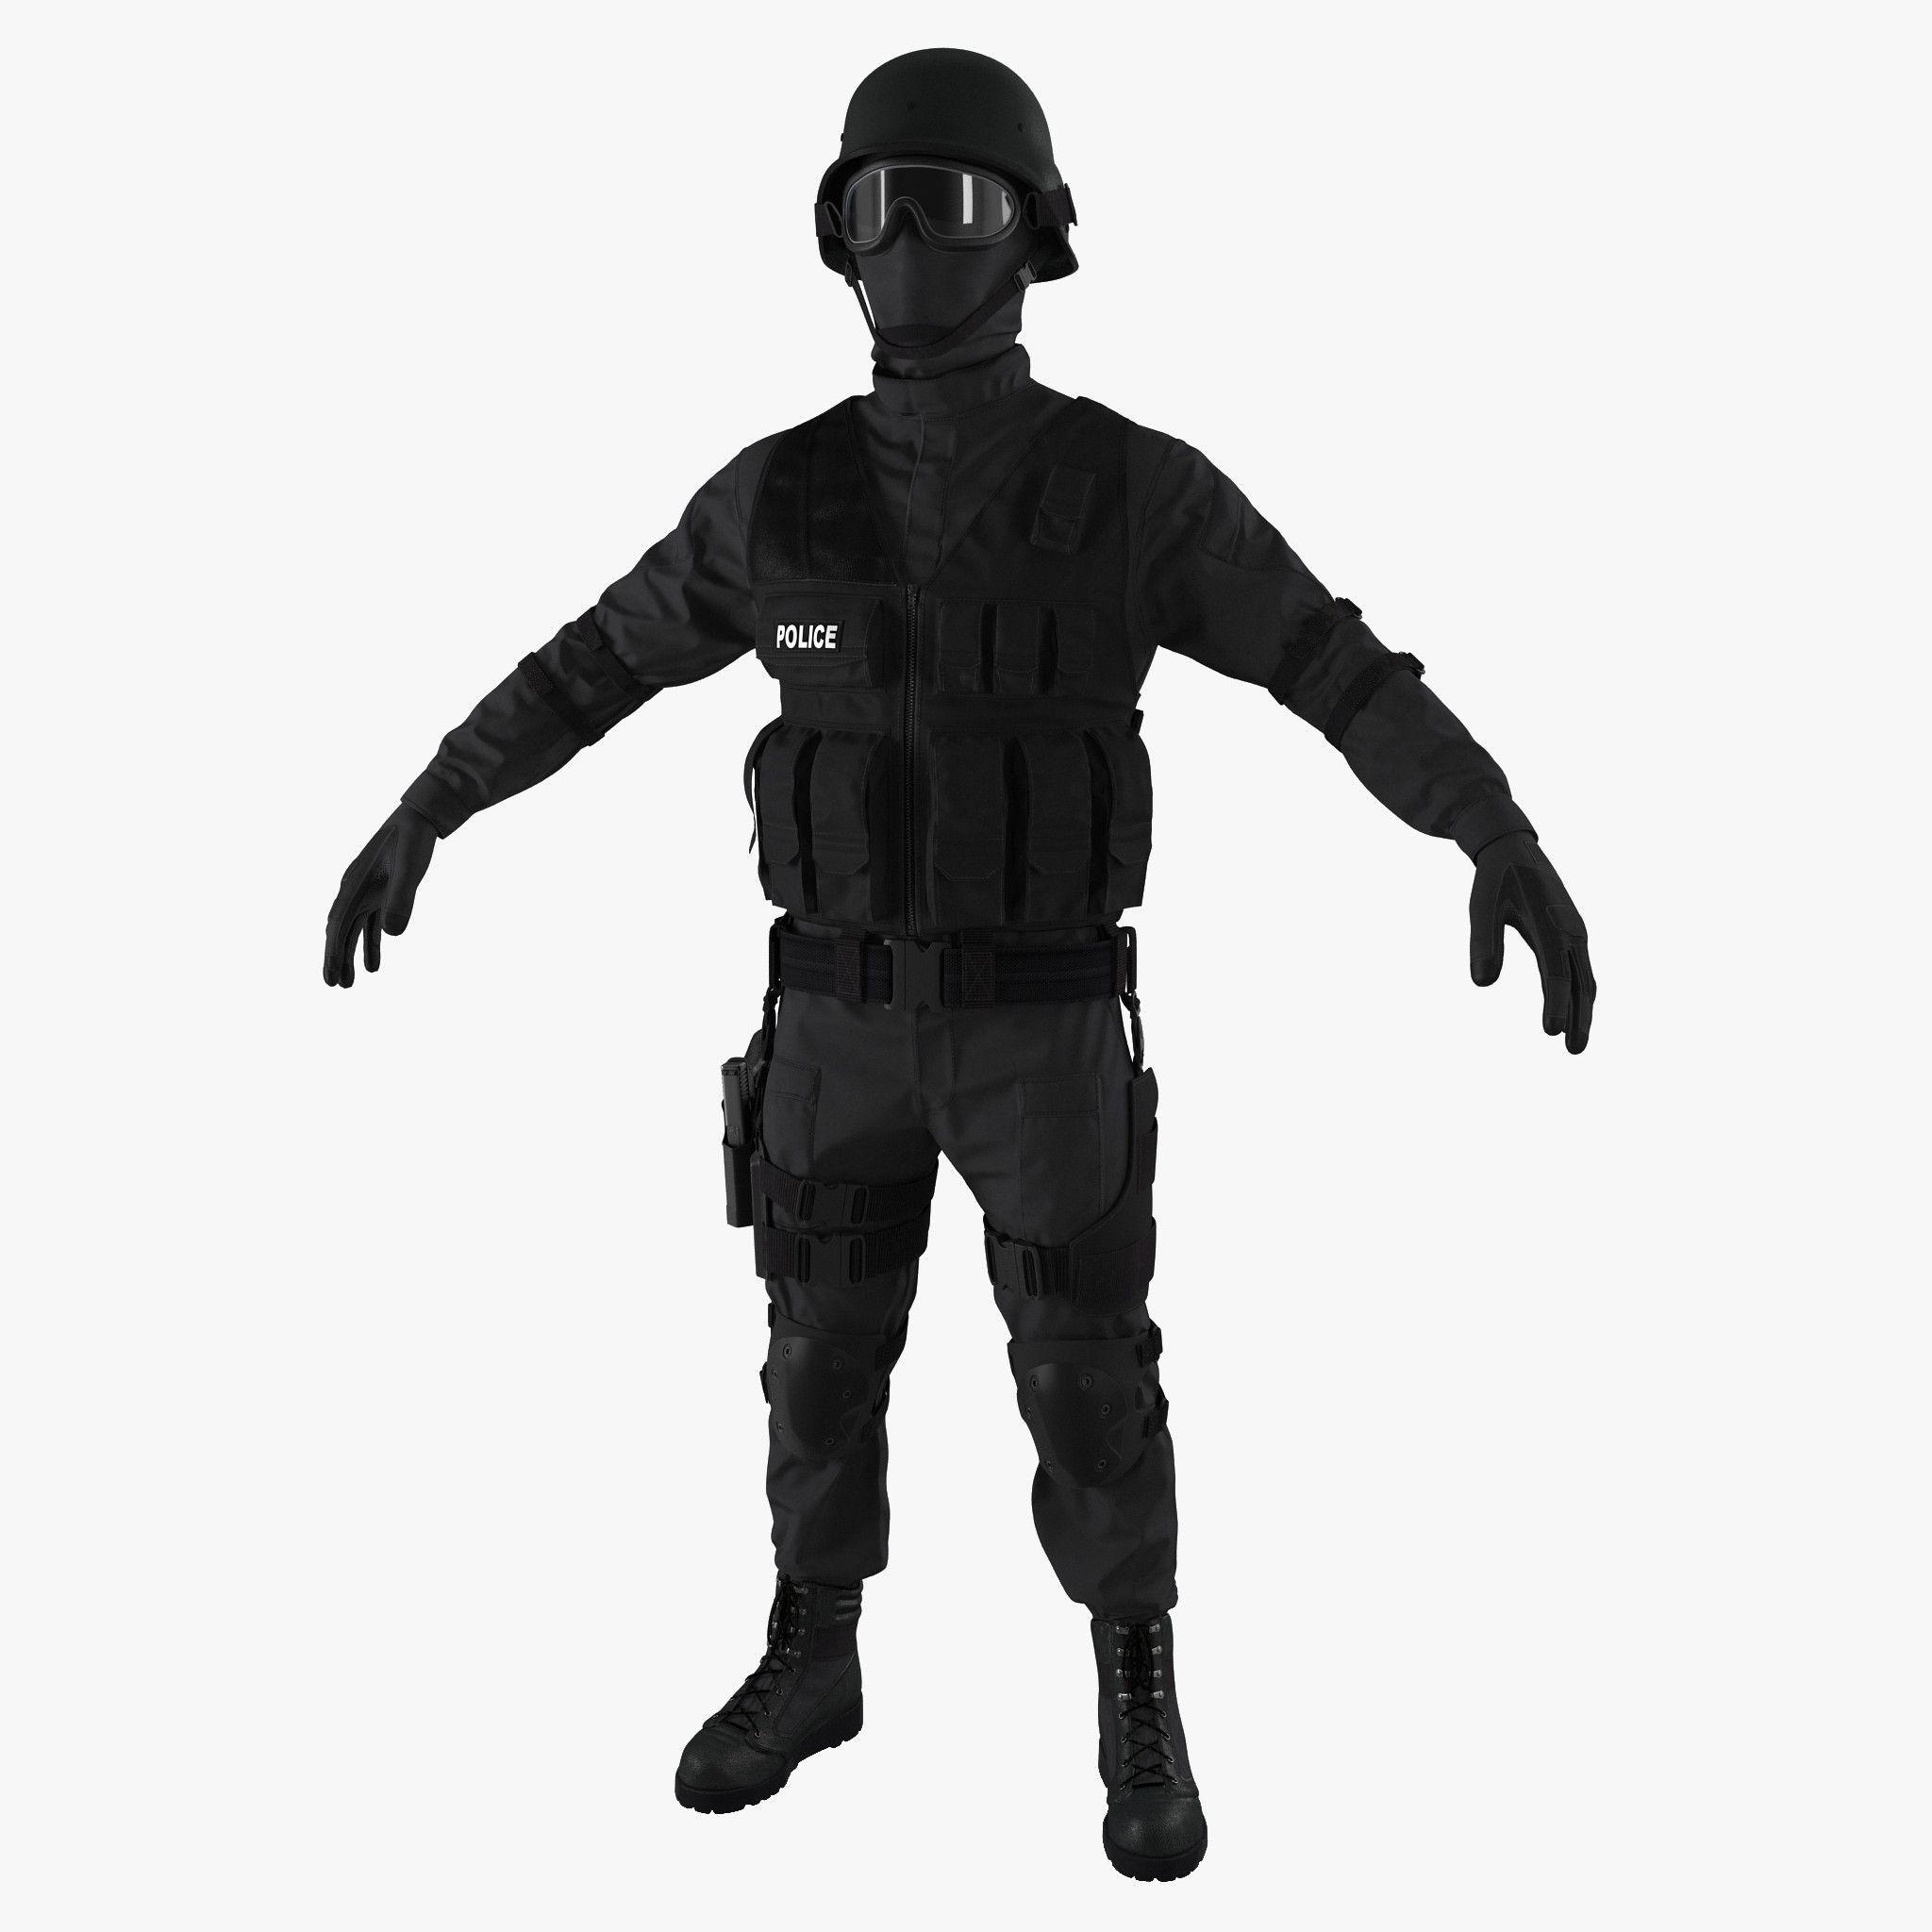 2048x2048 Swat Uniform 2 C4d Swat